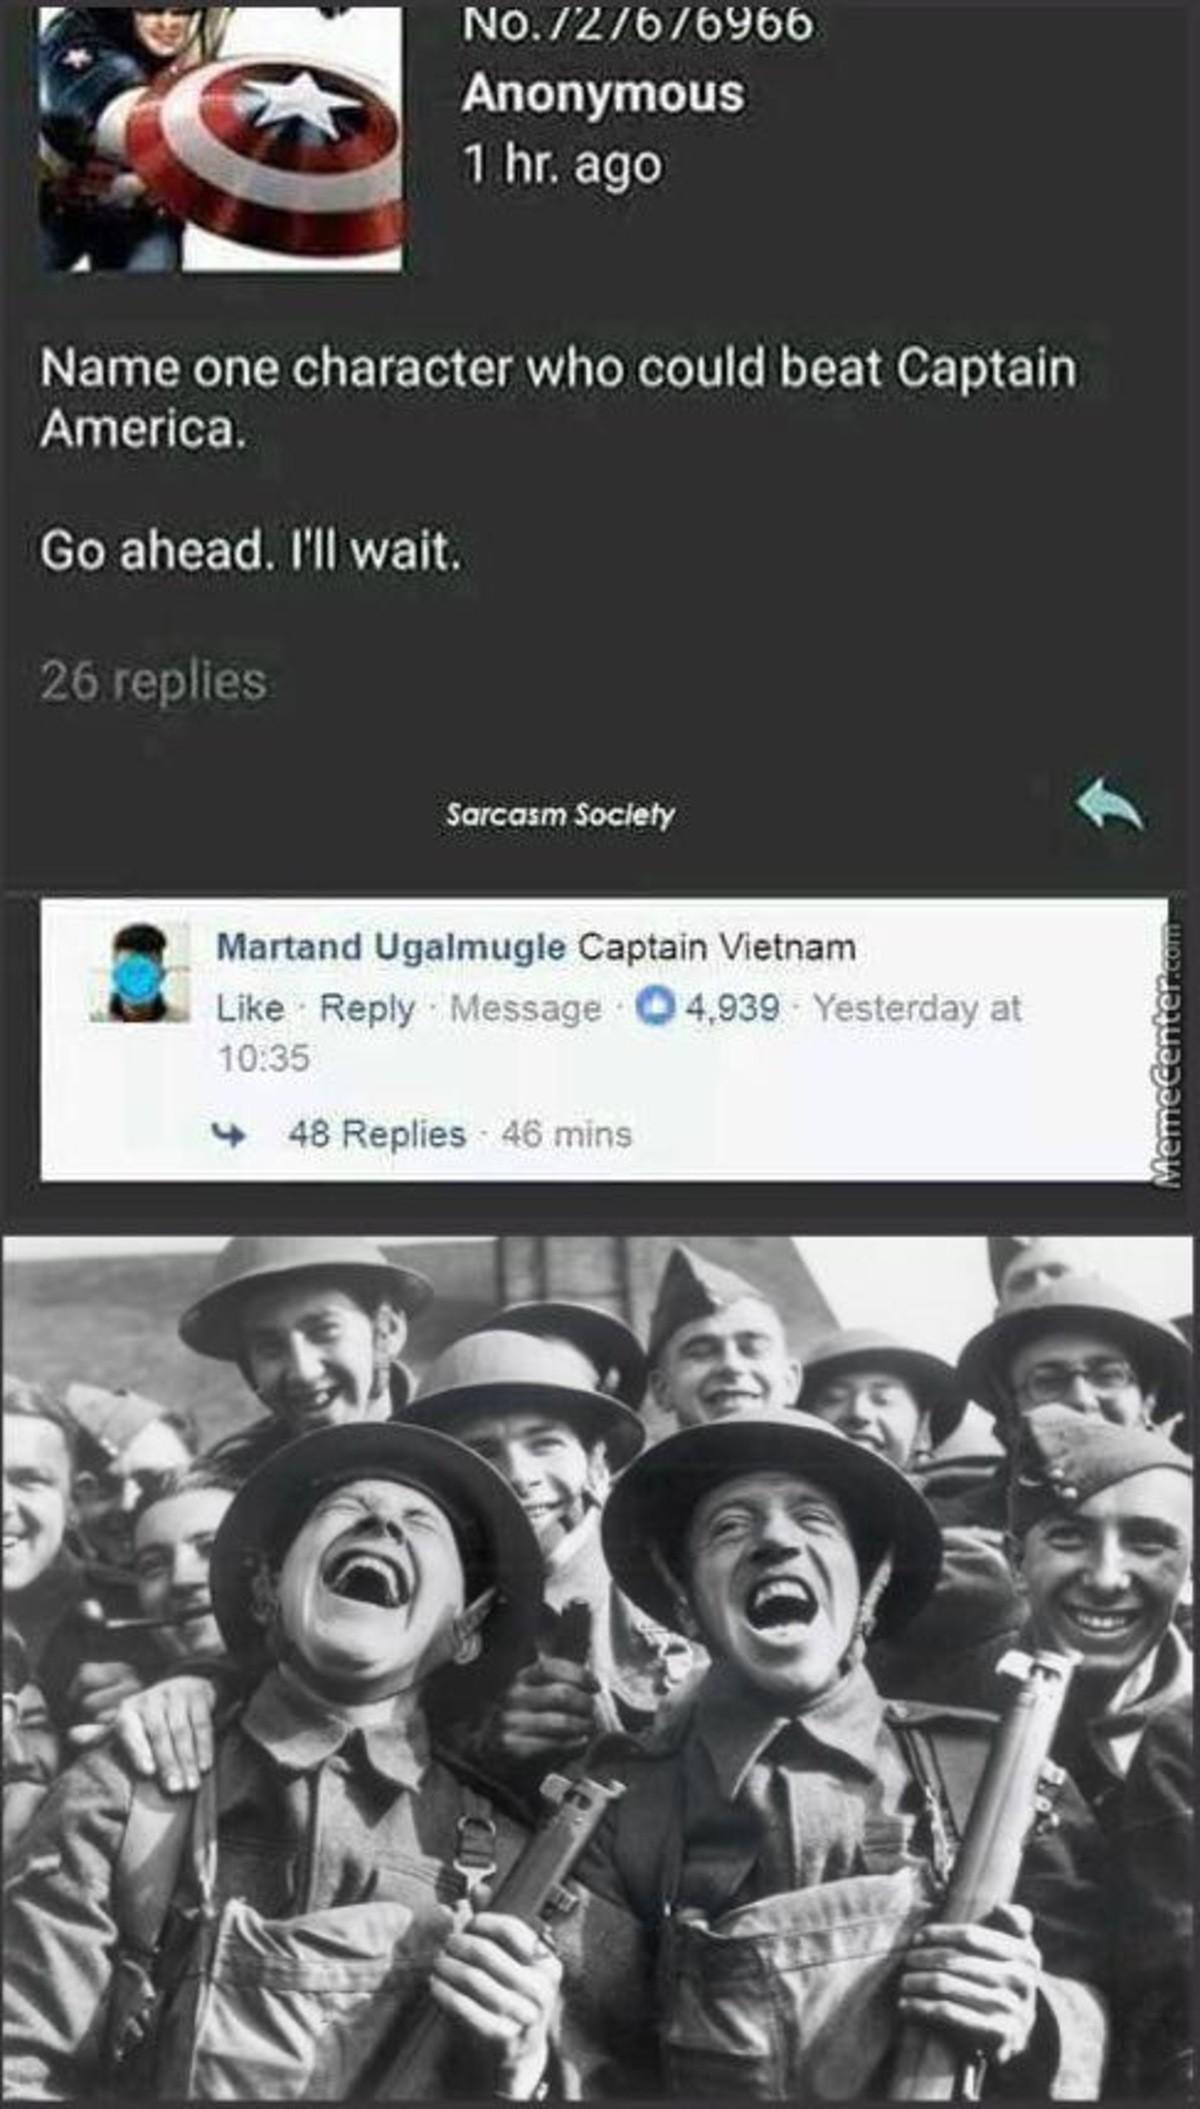 Daplei Zagancays Vitt. . I . 1 Anonymous 1 hr. ago Name one character who could beat Captain America. Go ahead. I' ll wait. Sarcasm Society k Mutant! Captain Vi Daplei Zagancays Vitt I 1 Anonymous hr ago Name one character who could beat Captain America Go ahead I' ll wait Sarcasm Society k Mutant! Vi